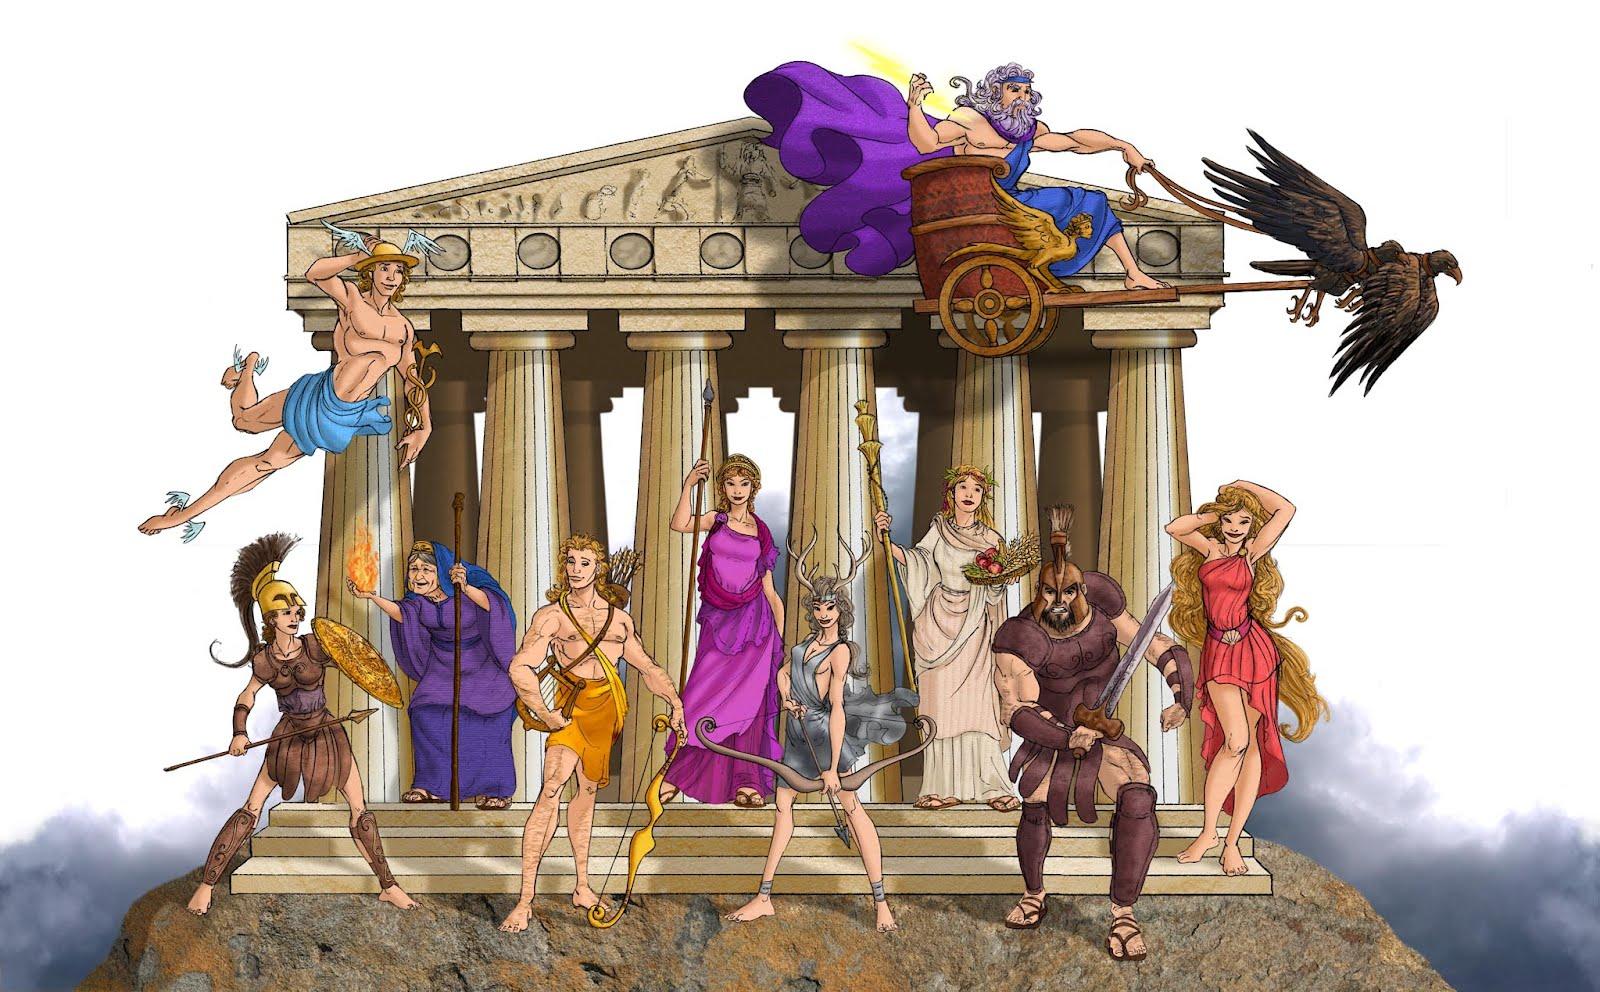 Asl diversificaci n los dioses del olimpo for Fenetre 0 5 3